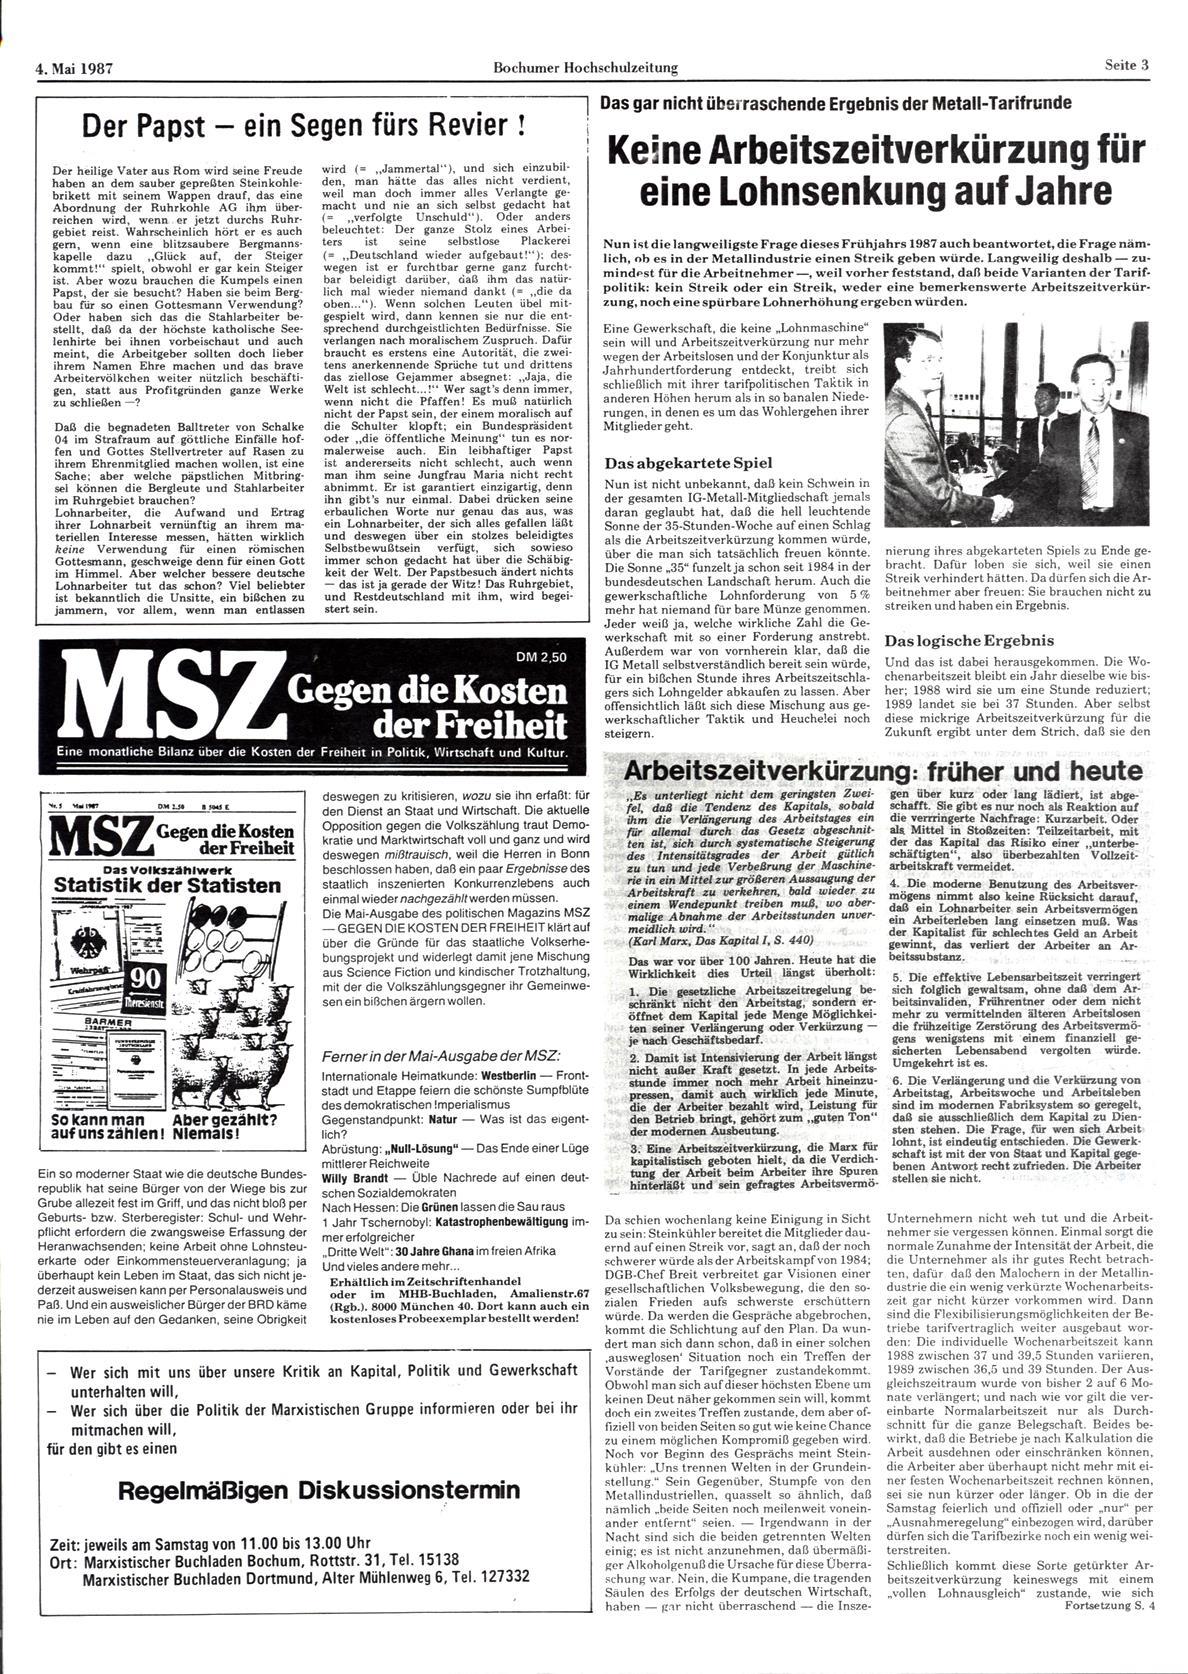 Bochum_BHZ_19870504_148_003